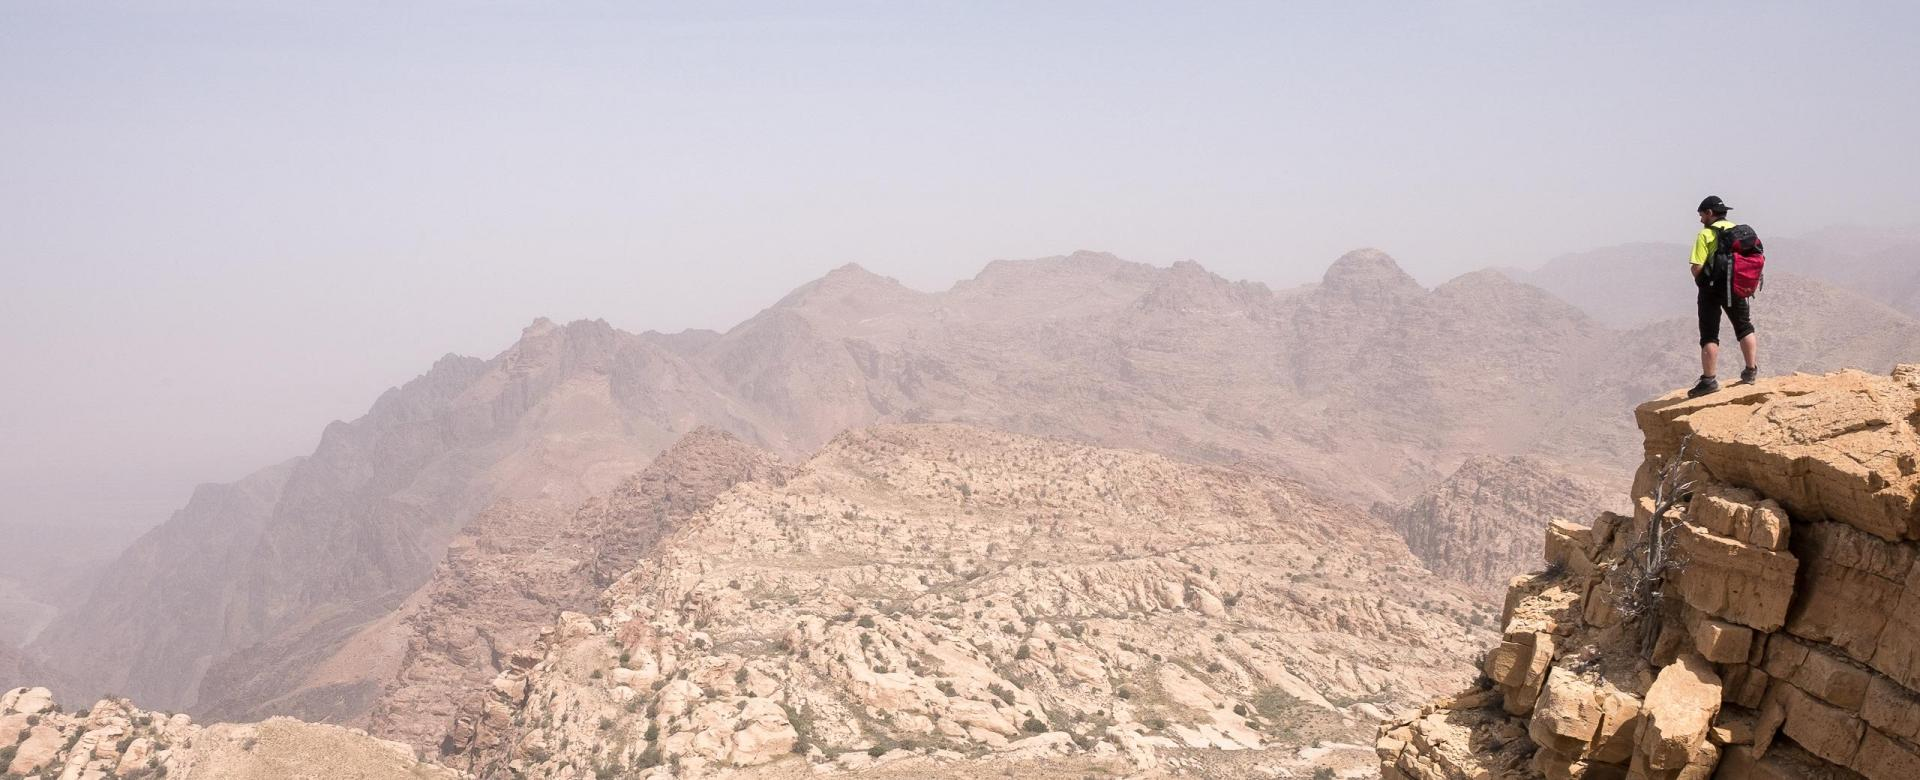 Voyage à pied : Wadi rum : vires et sommets du vertige